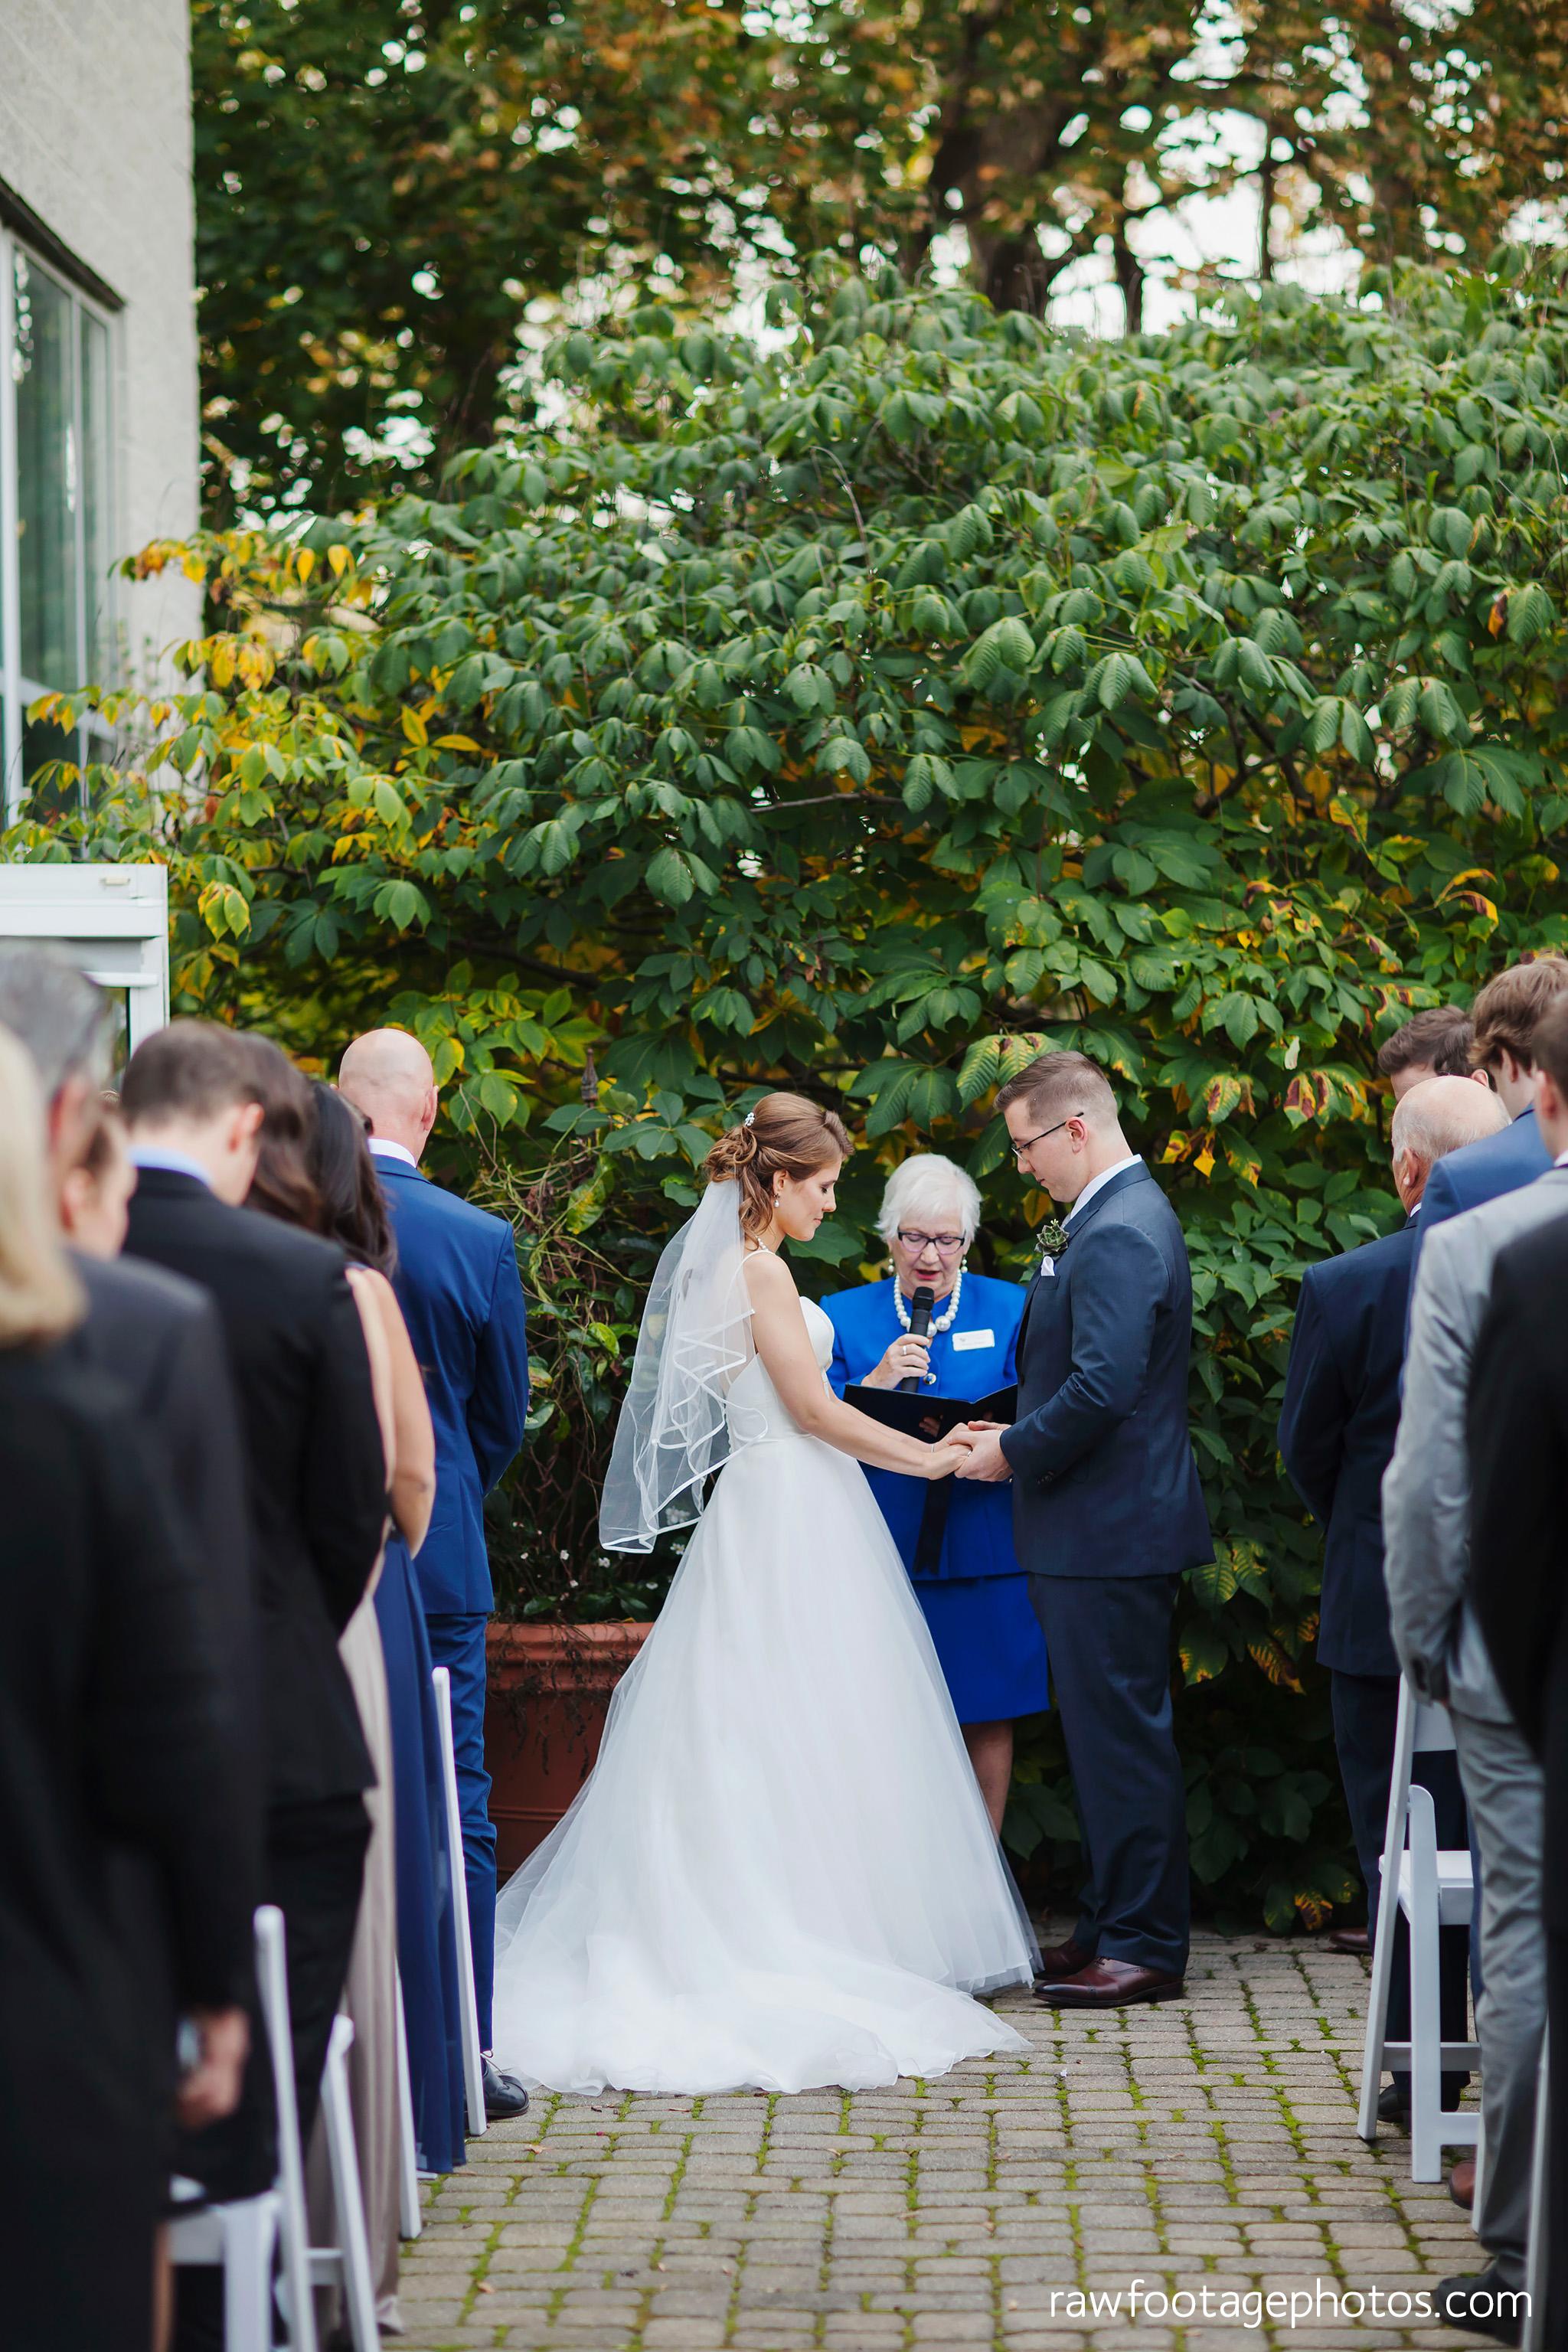 london_ontario_wedding_photographer-civic_gardens-springbank_park-succulent_bouquet-fall_wedding-bridge-raw_footage_photography038.jpg